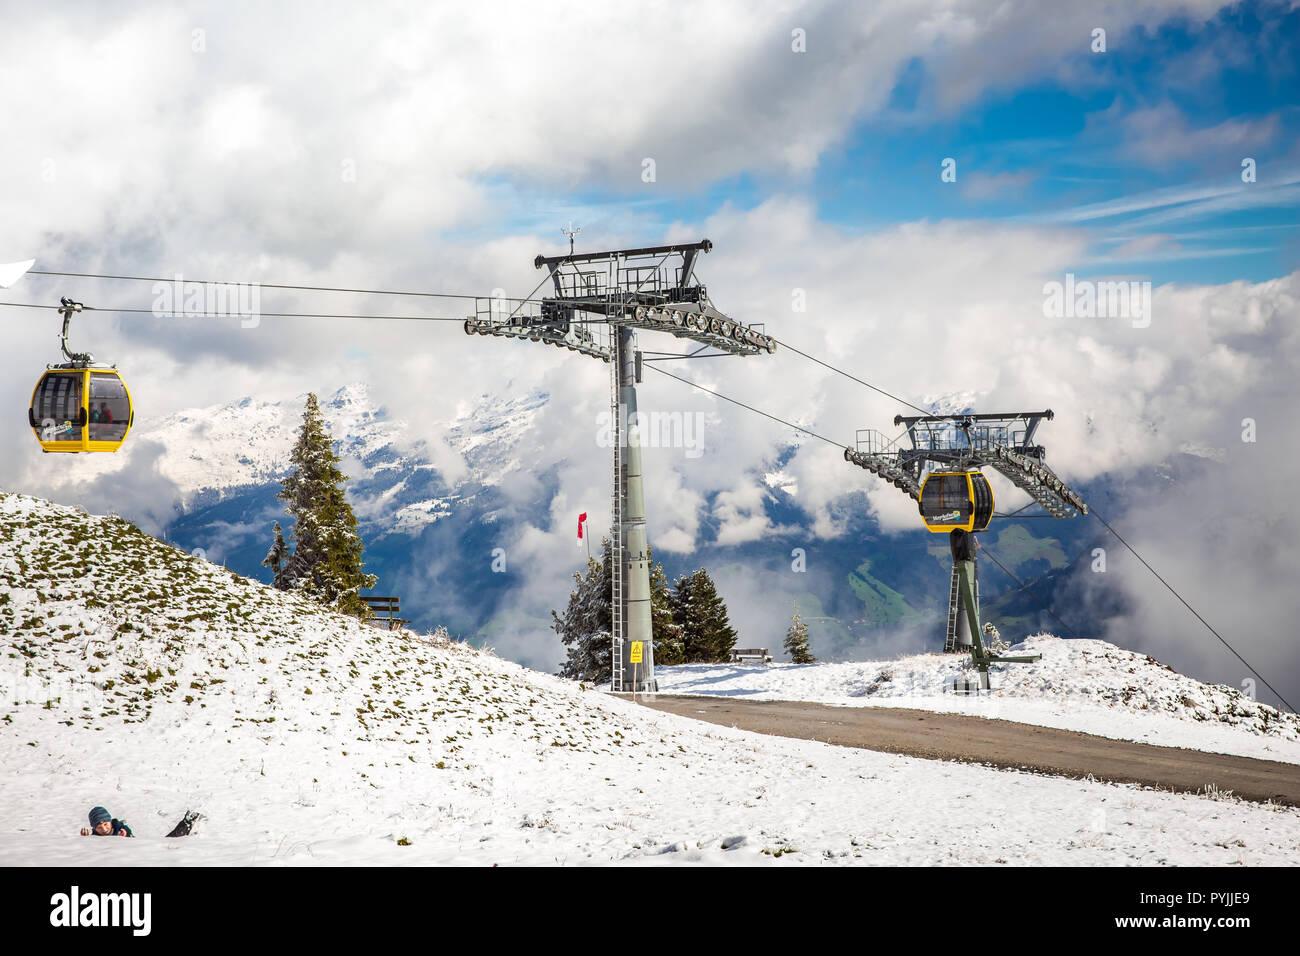 Mayrhofen, Austria - October, 2018: Cable car lift cabin Mayrhofner Bergbahnen on famous ski resort in Mayrhofen, Austria - Stock Image